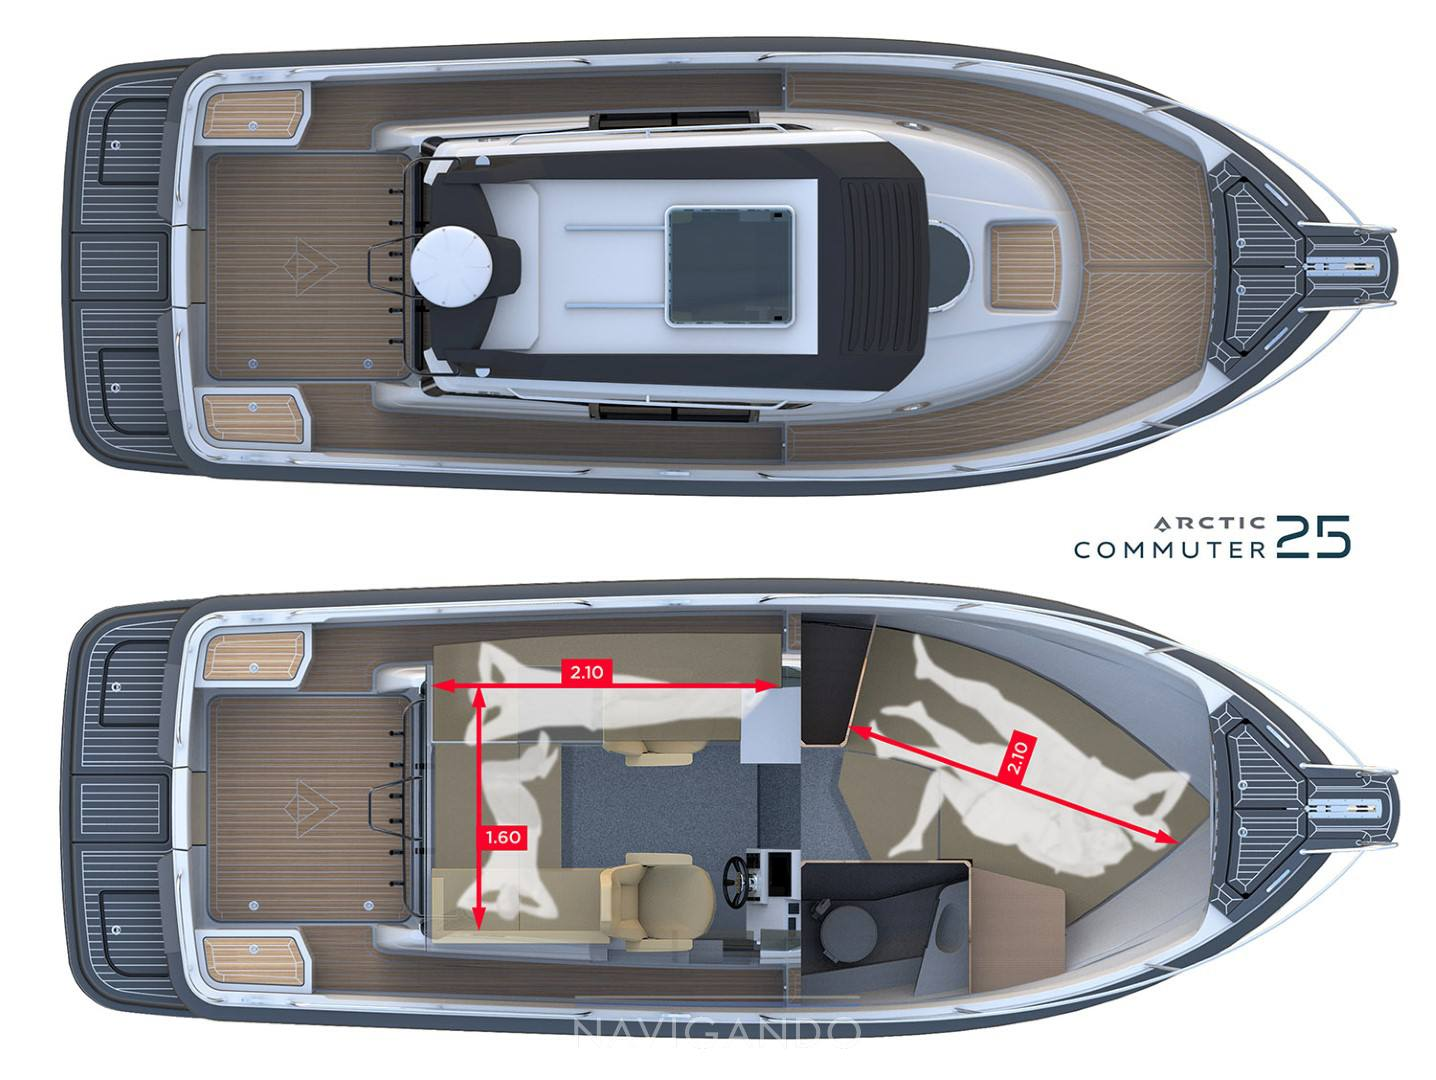 Artic Commuter 25 Motor yacht new